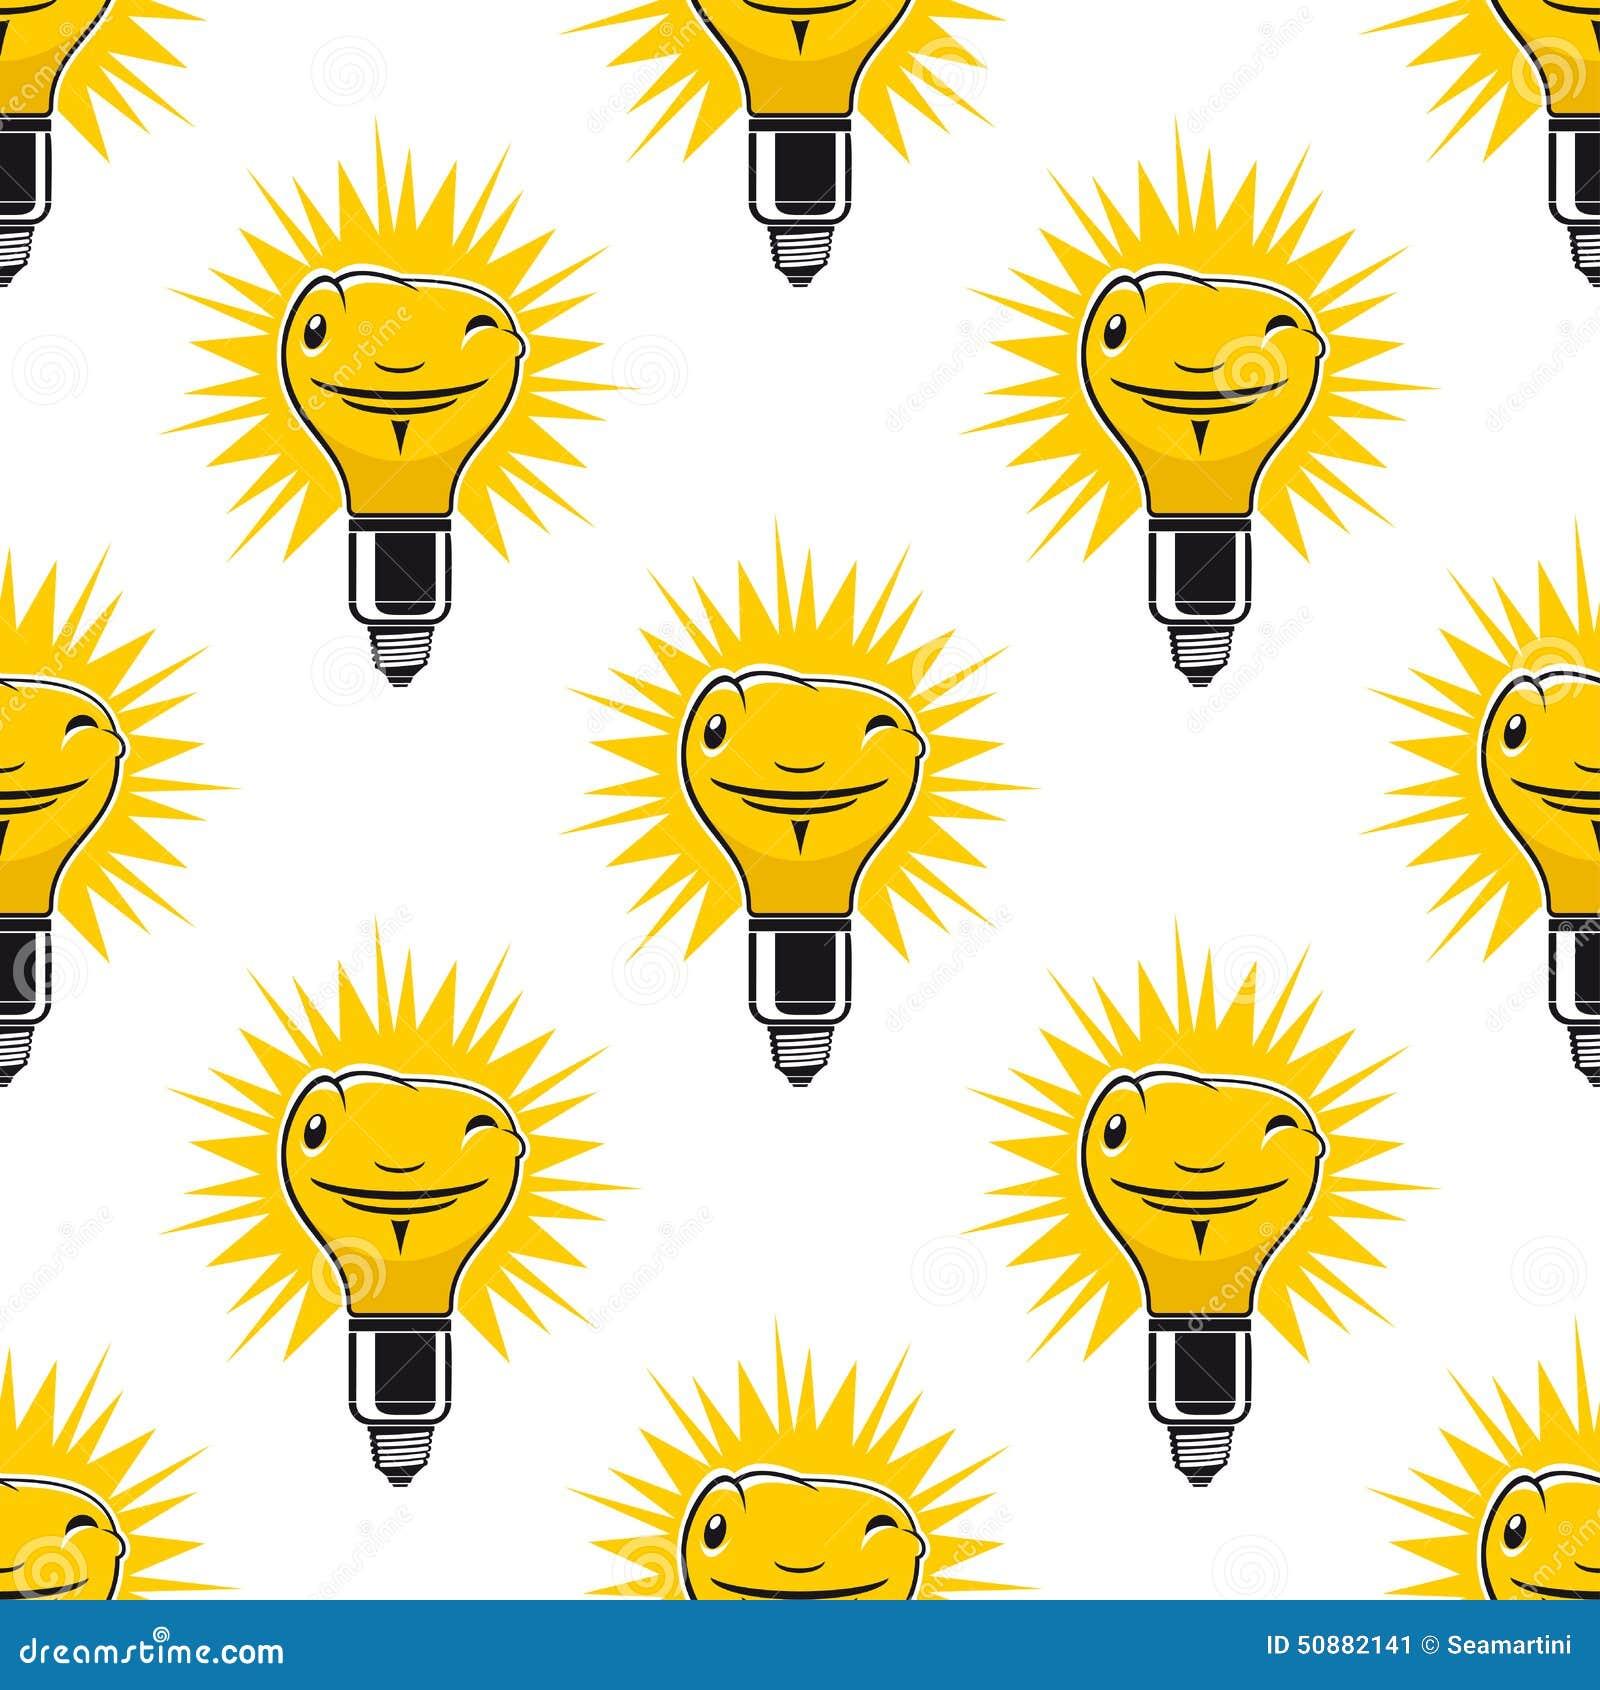 Light Bulb Wallpaper: Bright Cartoon Light Bulbs Seamless Pattern Stock Vector